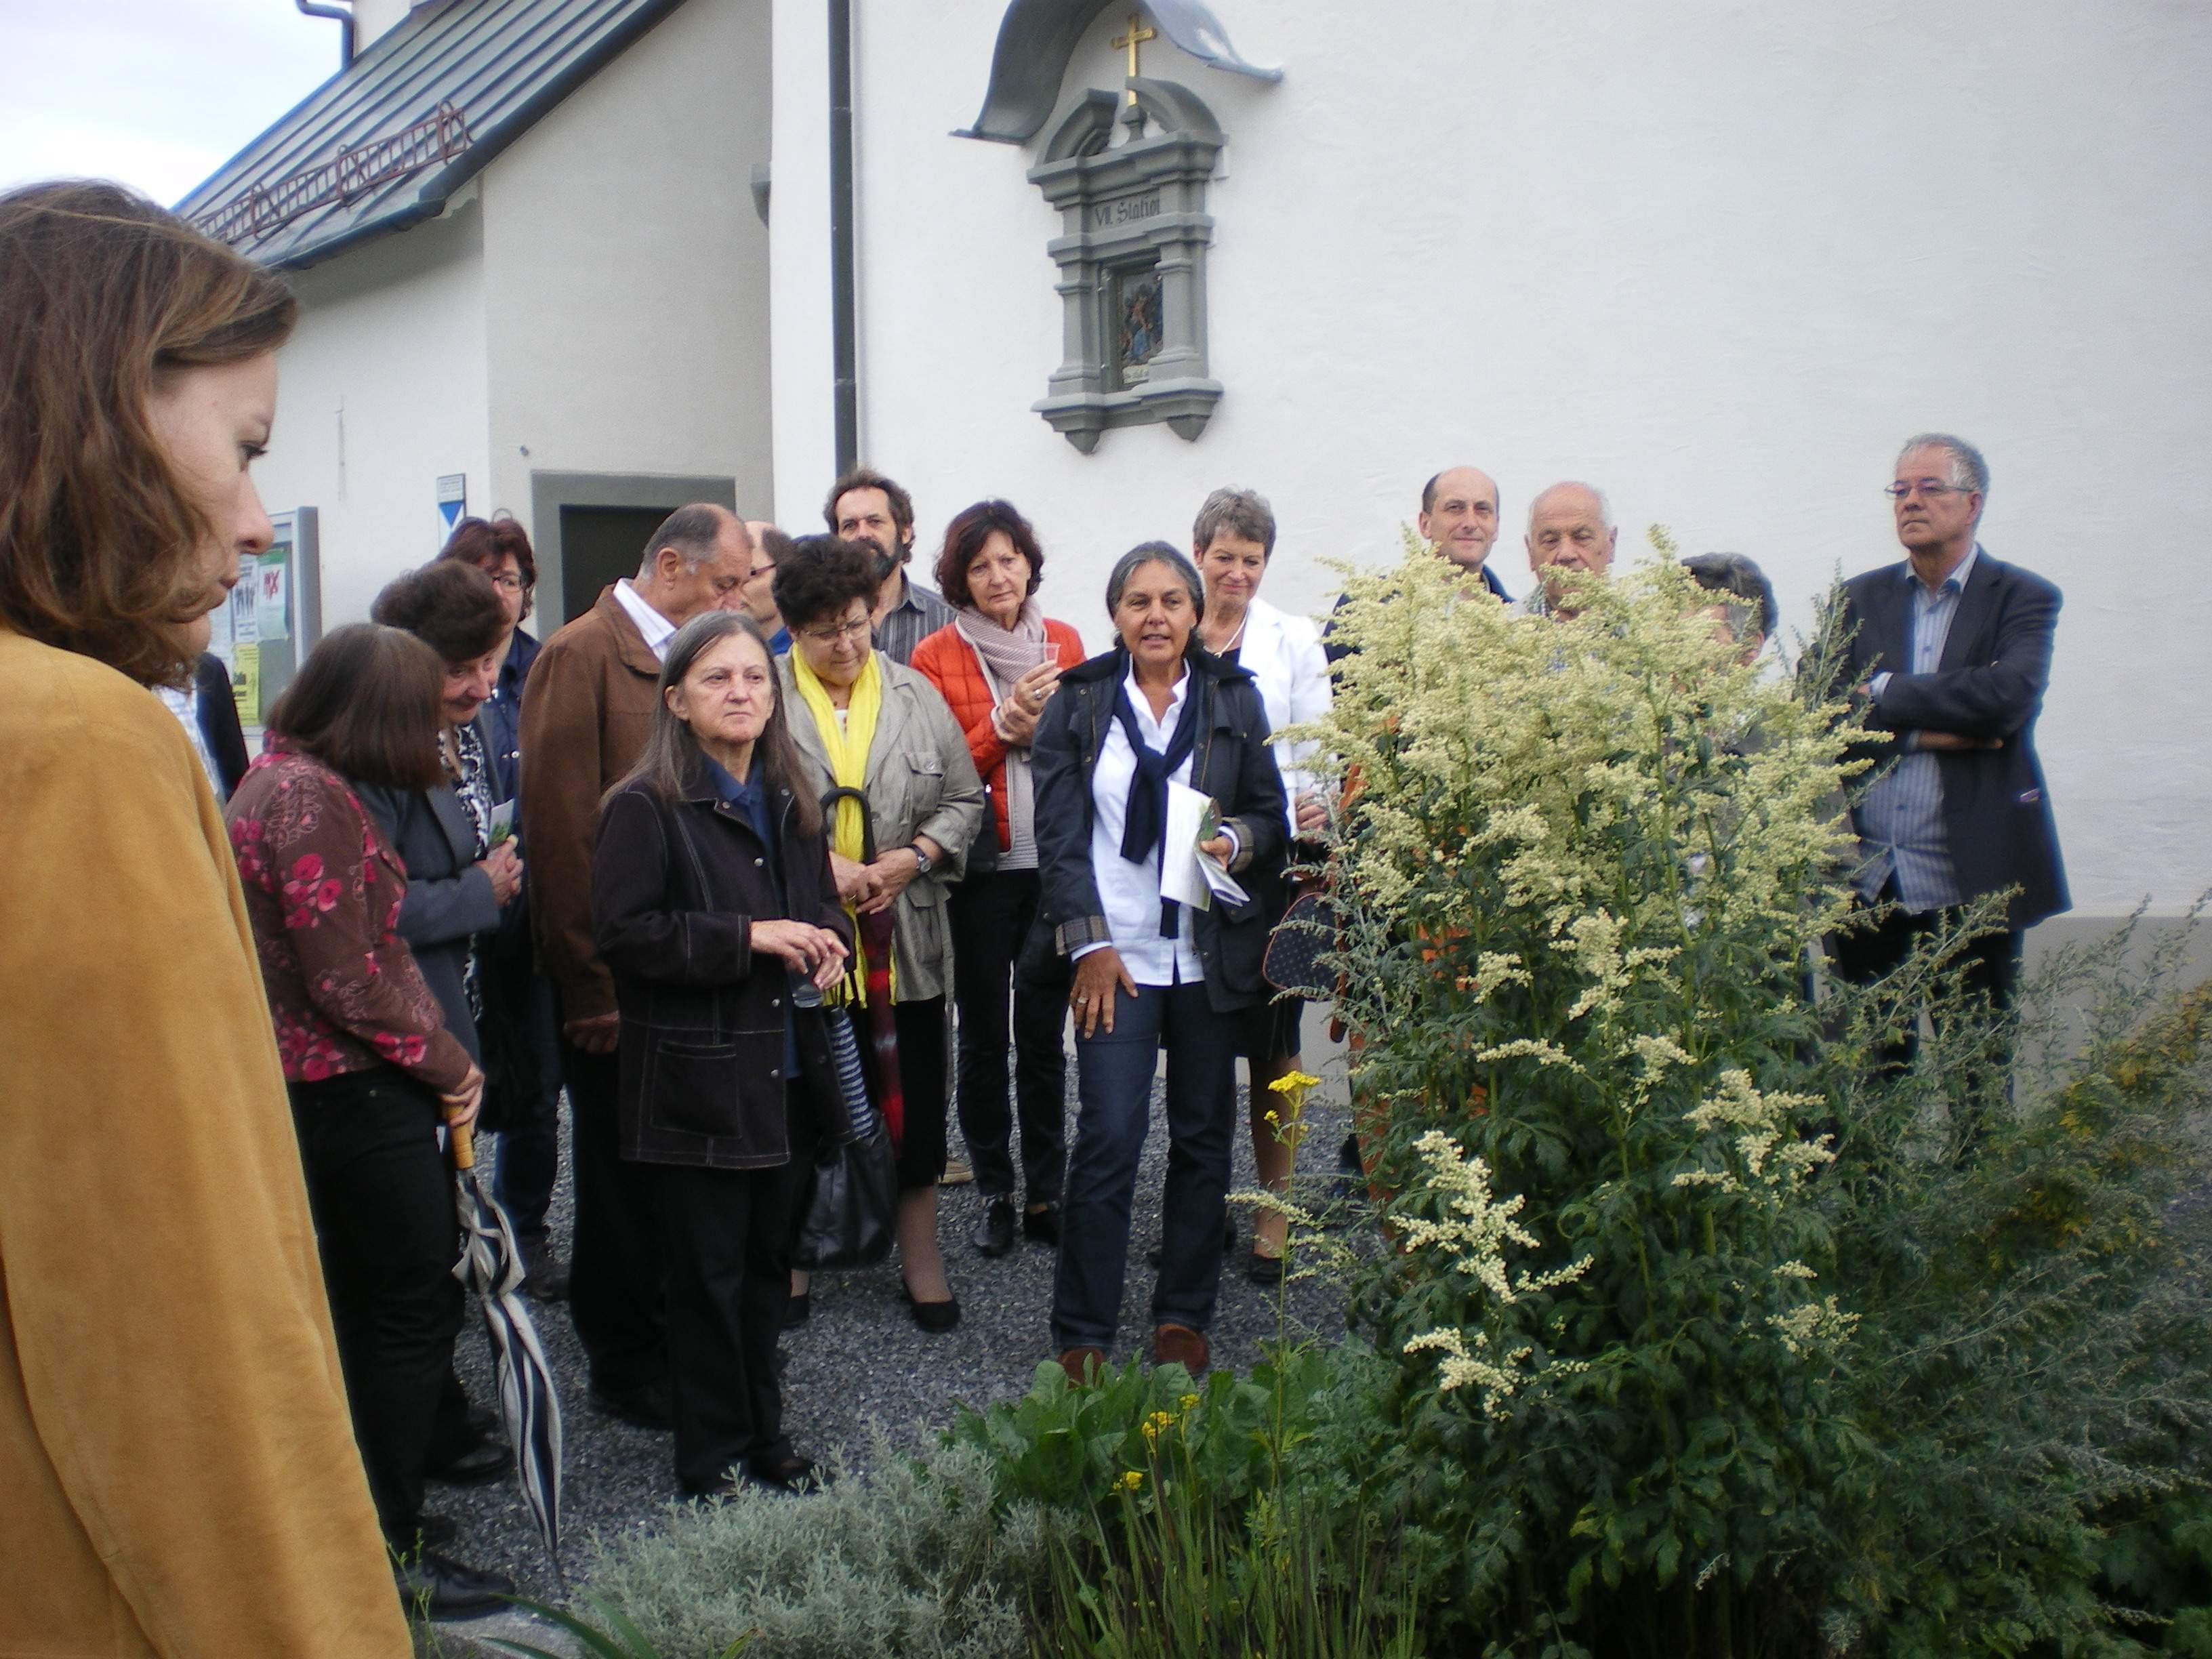 Großes Interesse an der Präsentation des neuen Flyers zum Mariengarten.